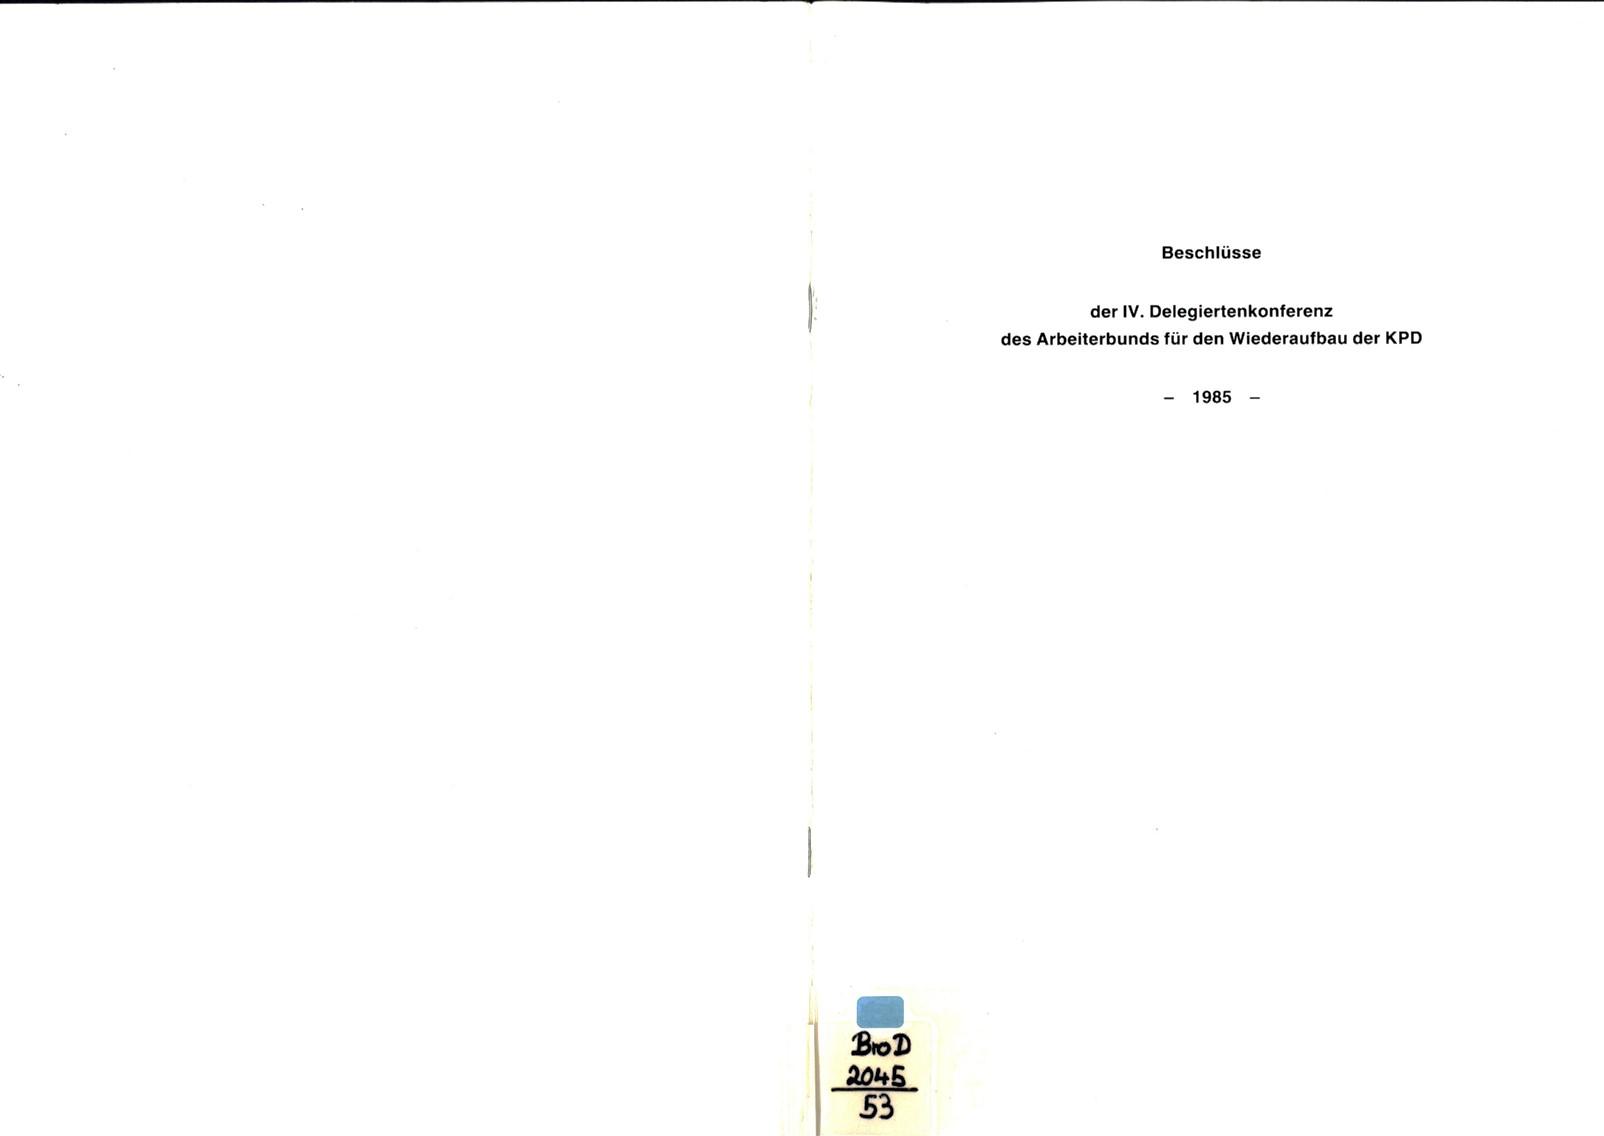 ABG_1985_Beschluesse_IV_Delegiertenkonferenz_02